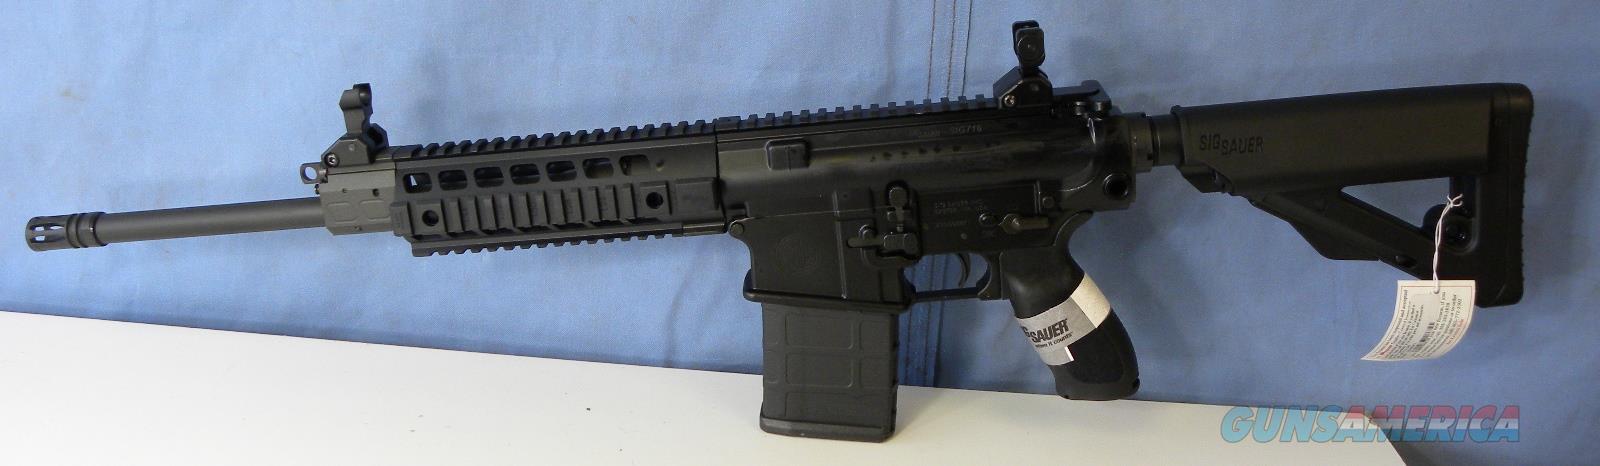 Sig Sauer 716-16B-P  Guns > Rifles > Sig - Sauer/Sigarms Rifles